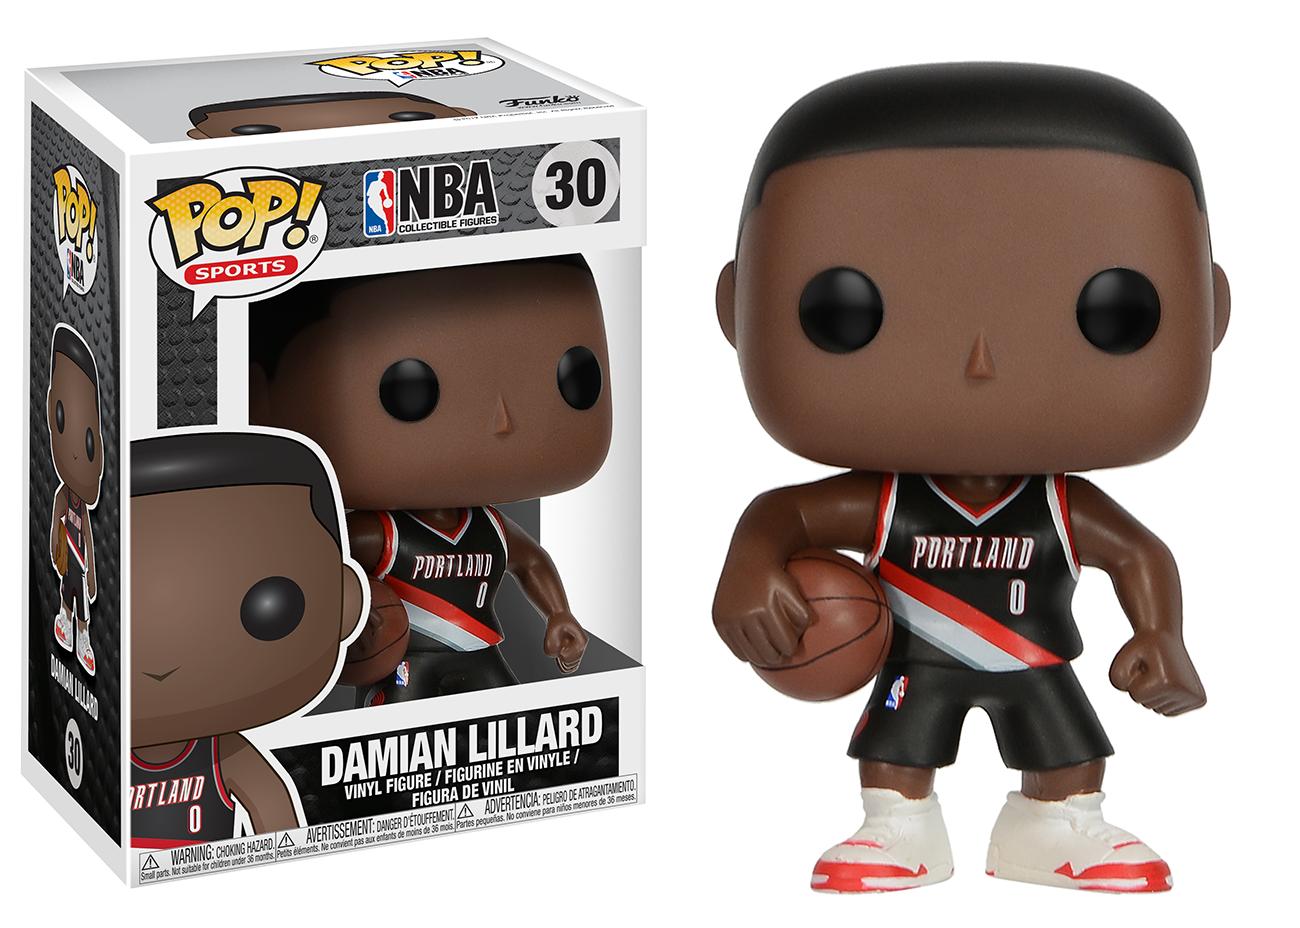 Pop Sports Nba Damian Lillard Vinyl Figures Julio Jones Pop Figurine